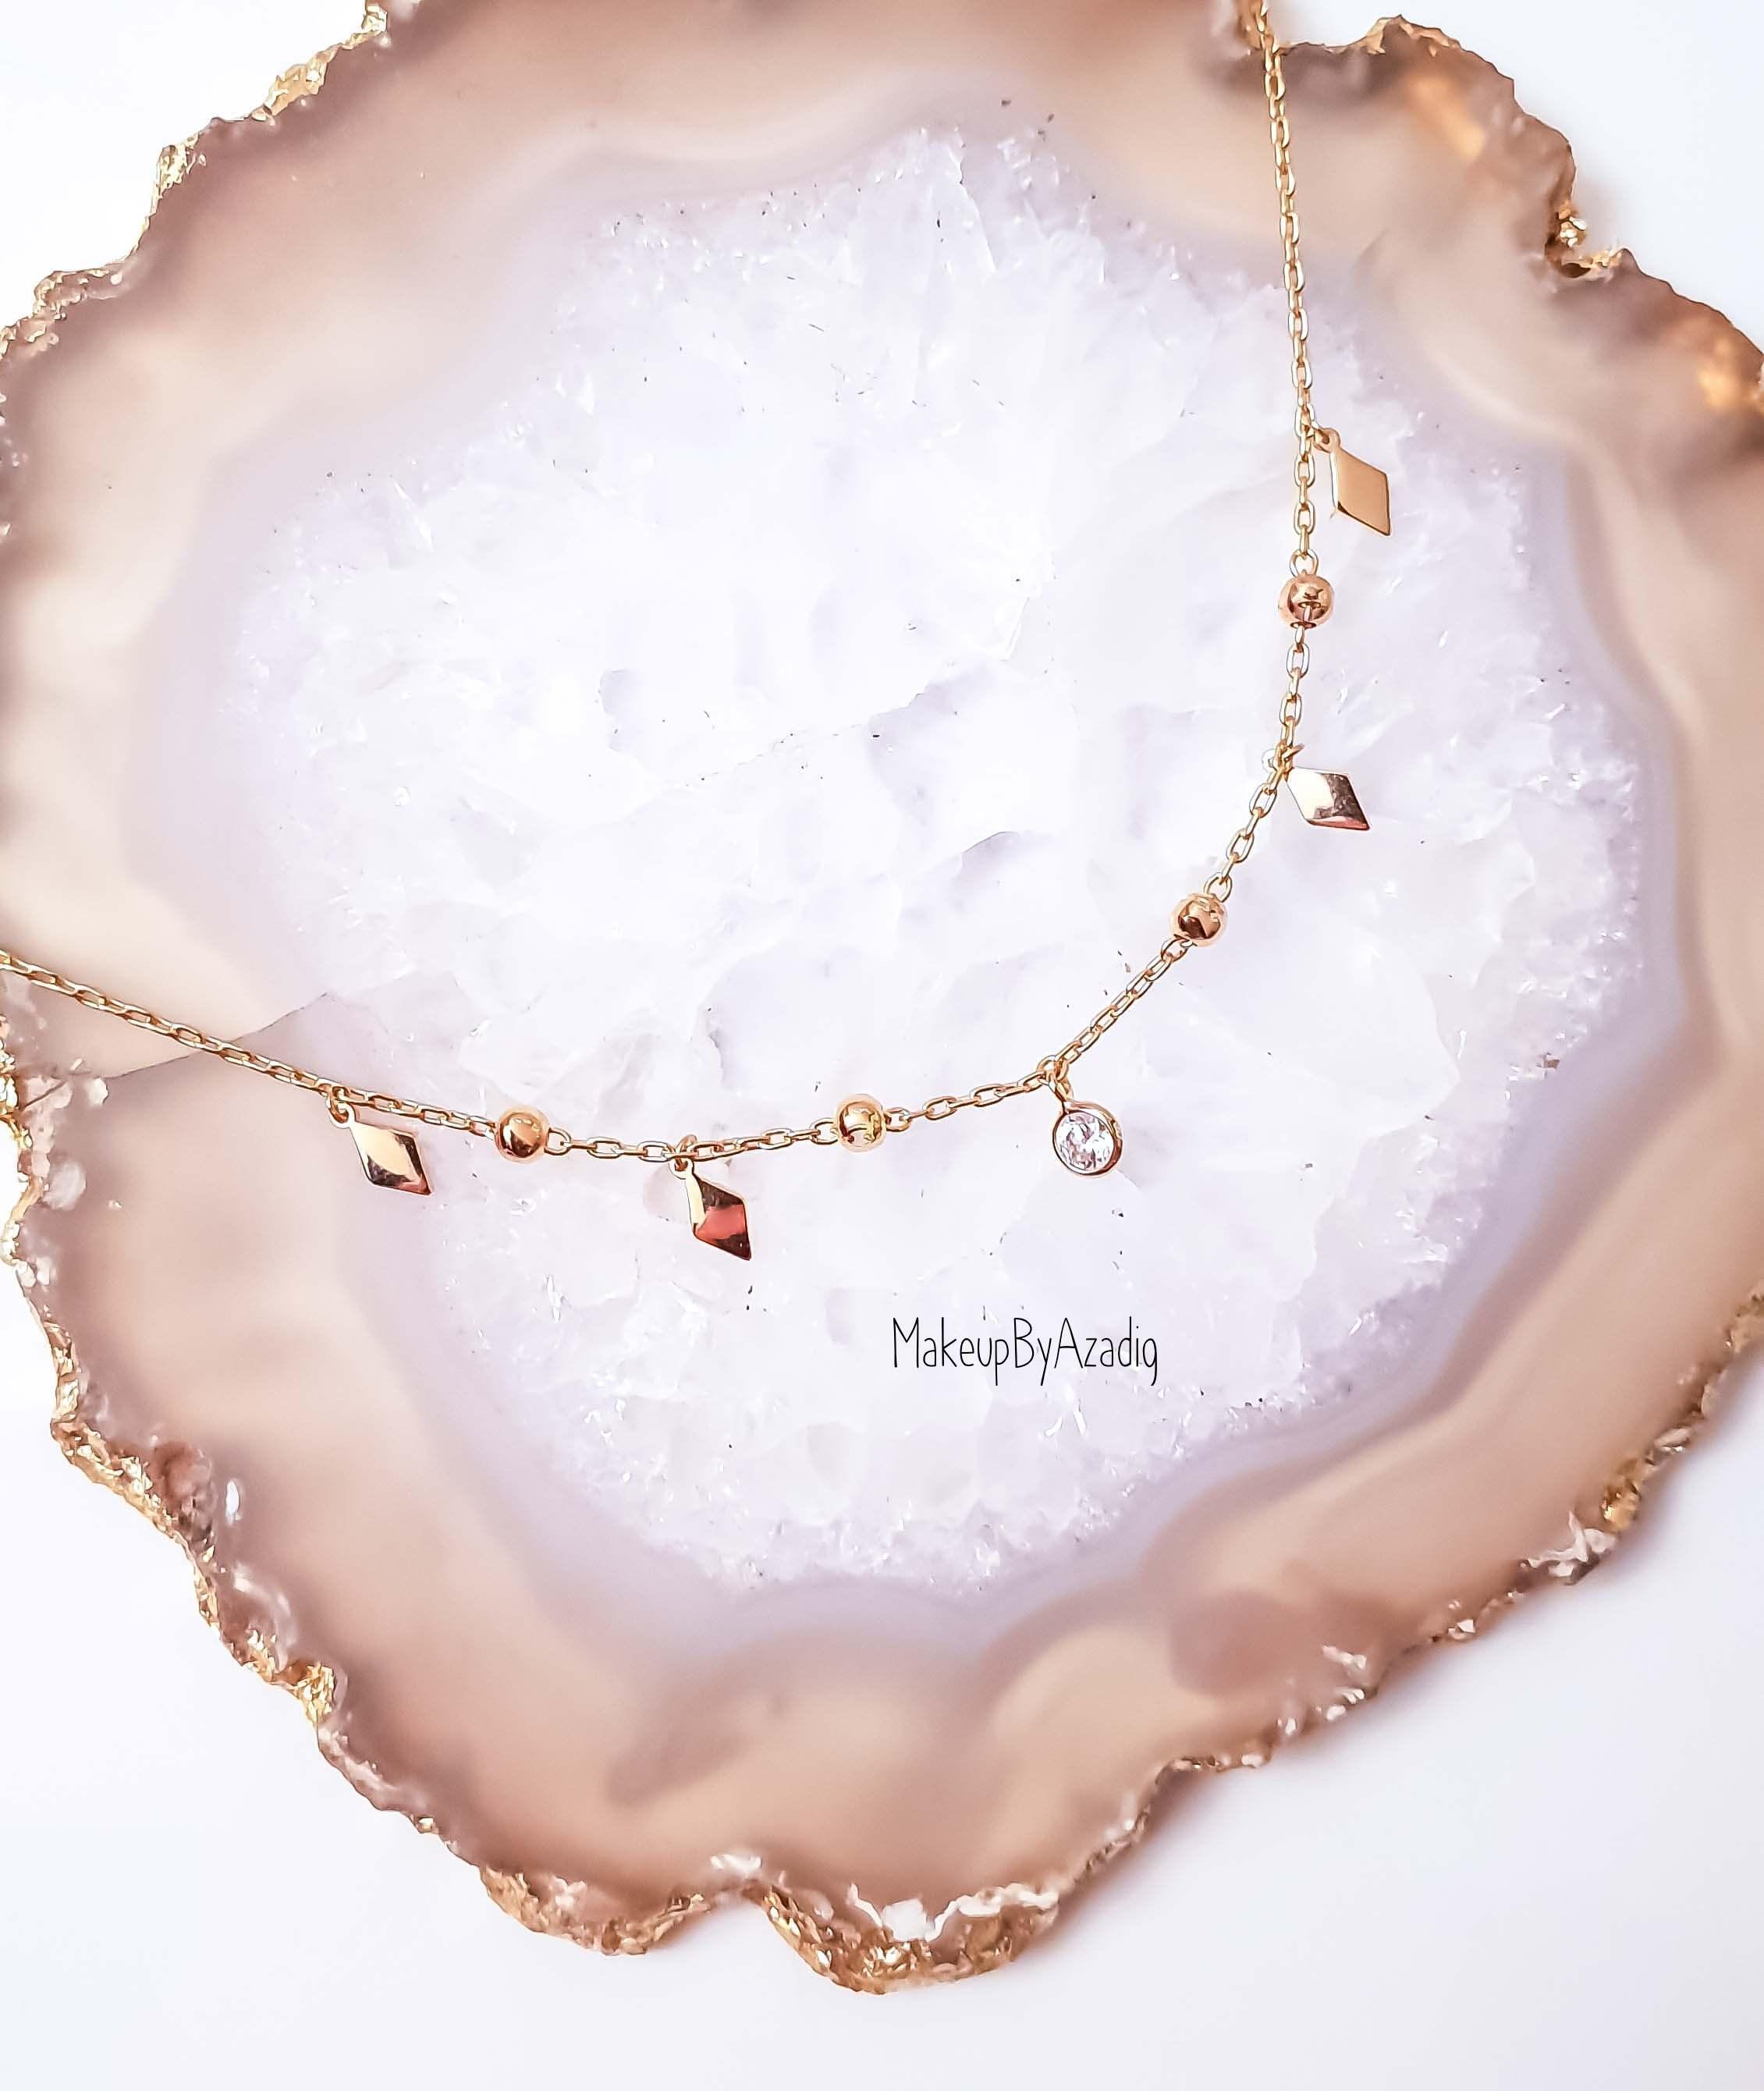 revue-bougie-bijou-qualite-myjoliecandle-linge-frais-propre-code-promo-makeupbyazadig-collier-bracelet-bague-avis-prix-cadeau-femme-plaque-or